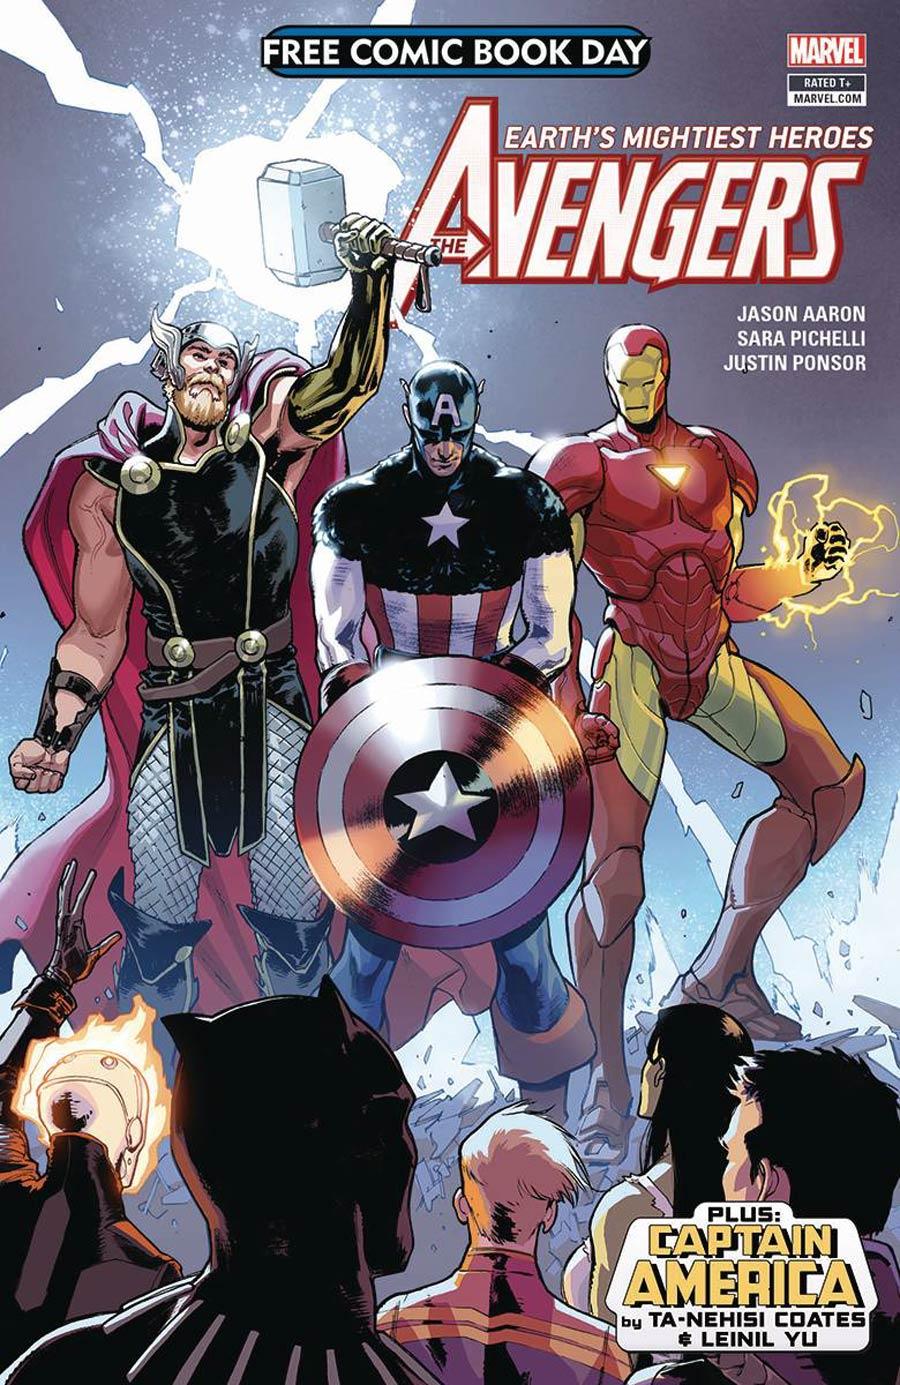 Avengers Captain America FCBD 2018 Cover A Regular Version